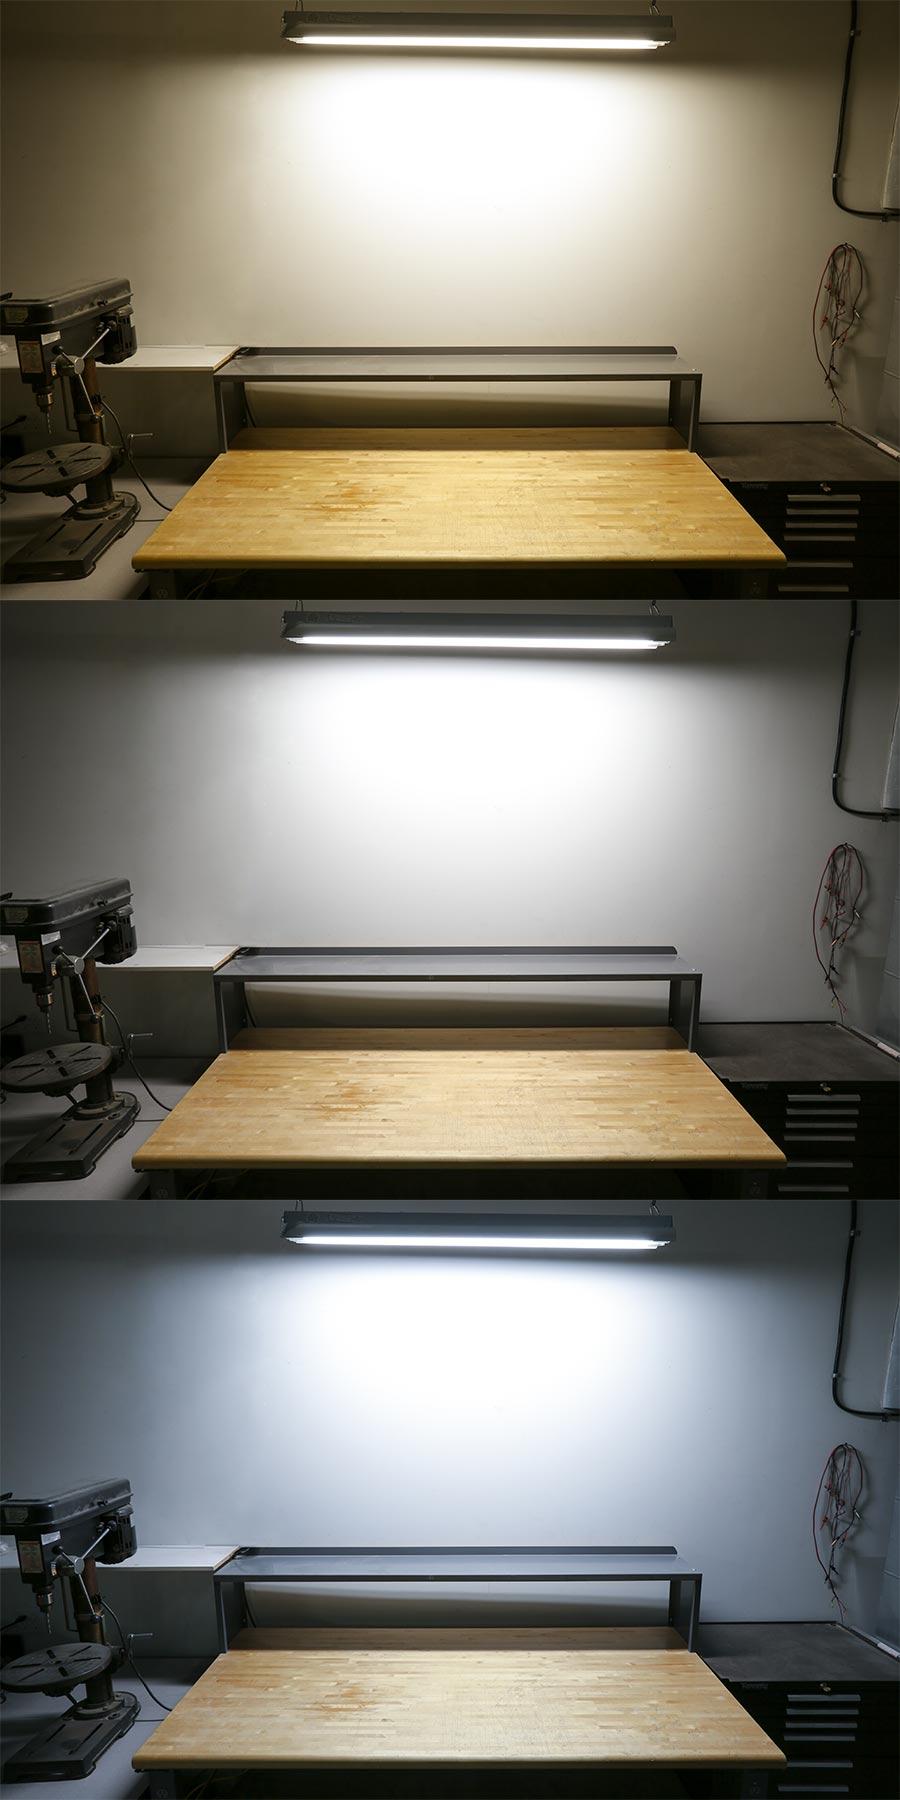 shatterproof T8 LED tube light bulb color temperatures